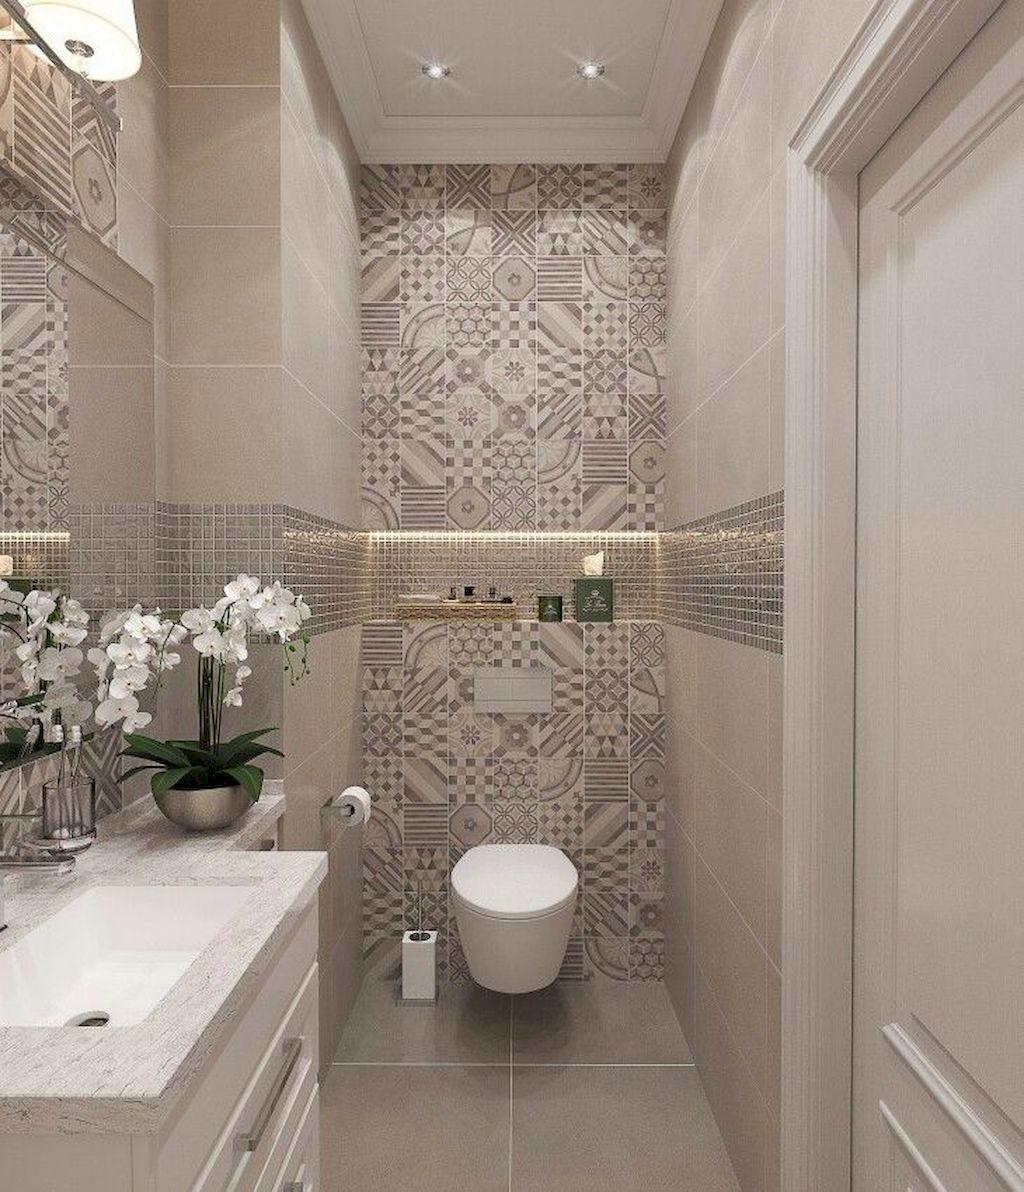 75 cool small master bathroom renovation ideas bathroom on amazing small bathroom designs and ideas id=26467